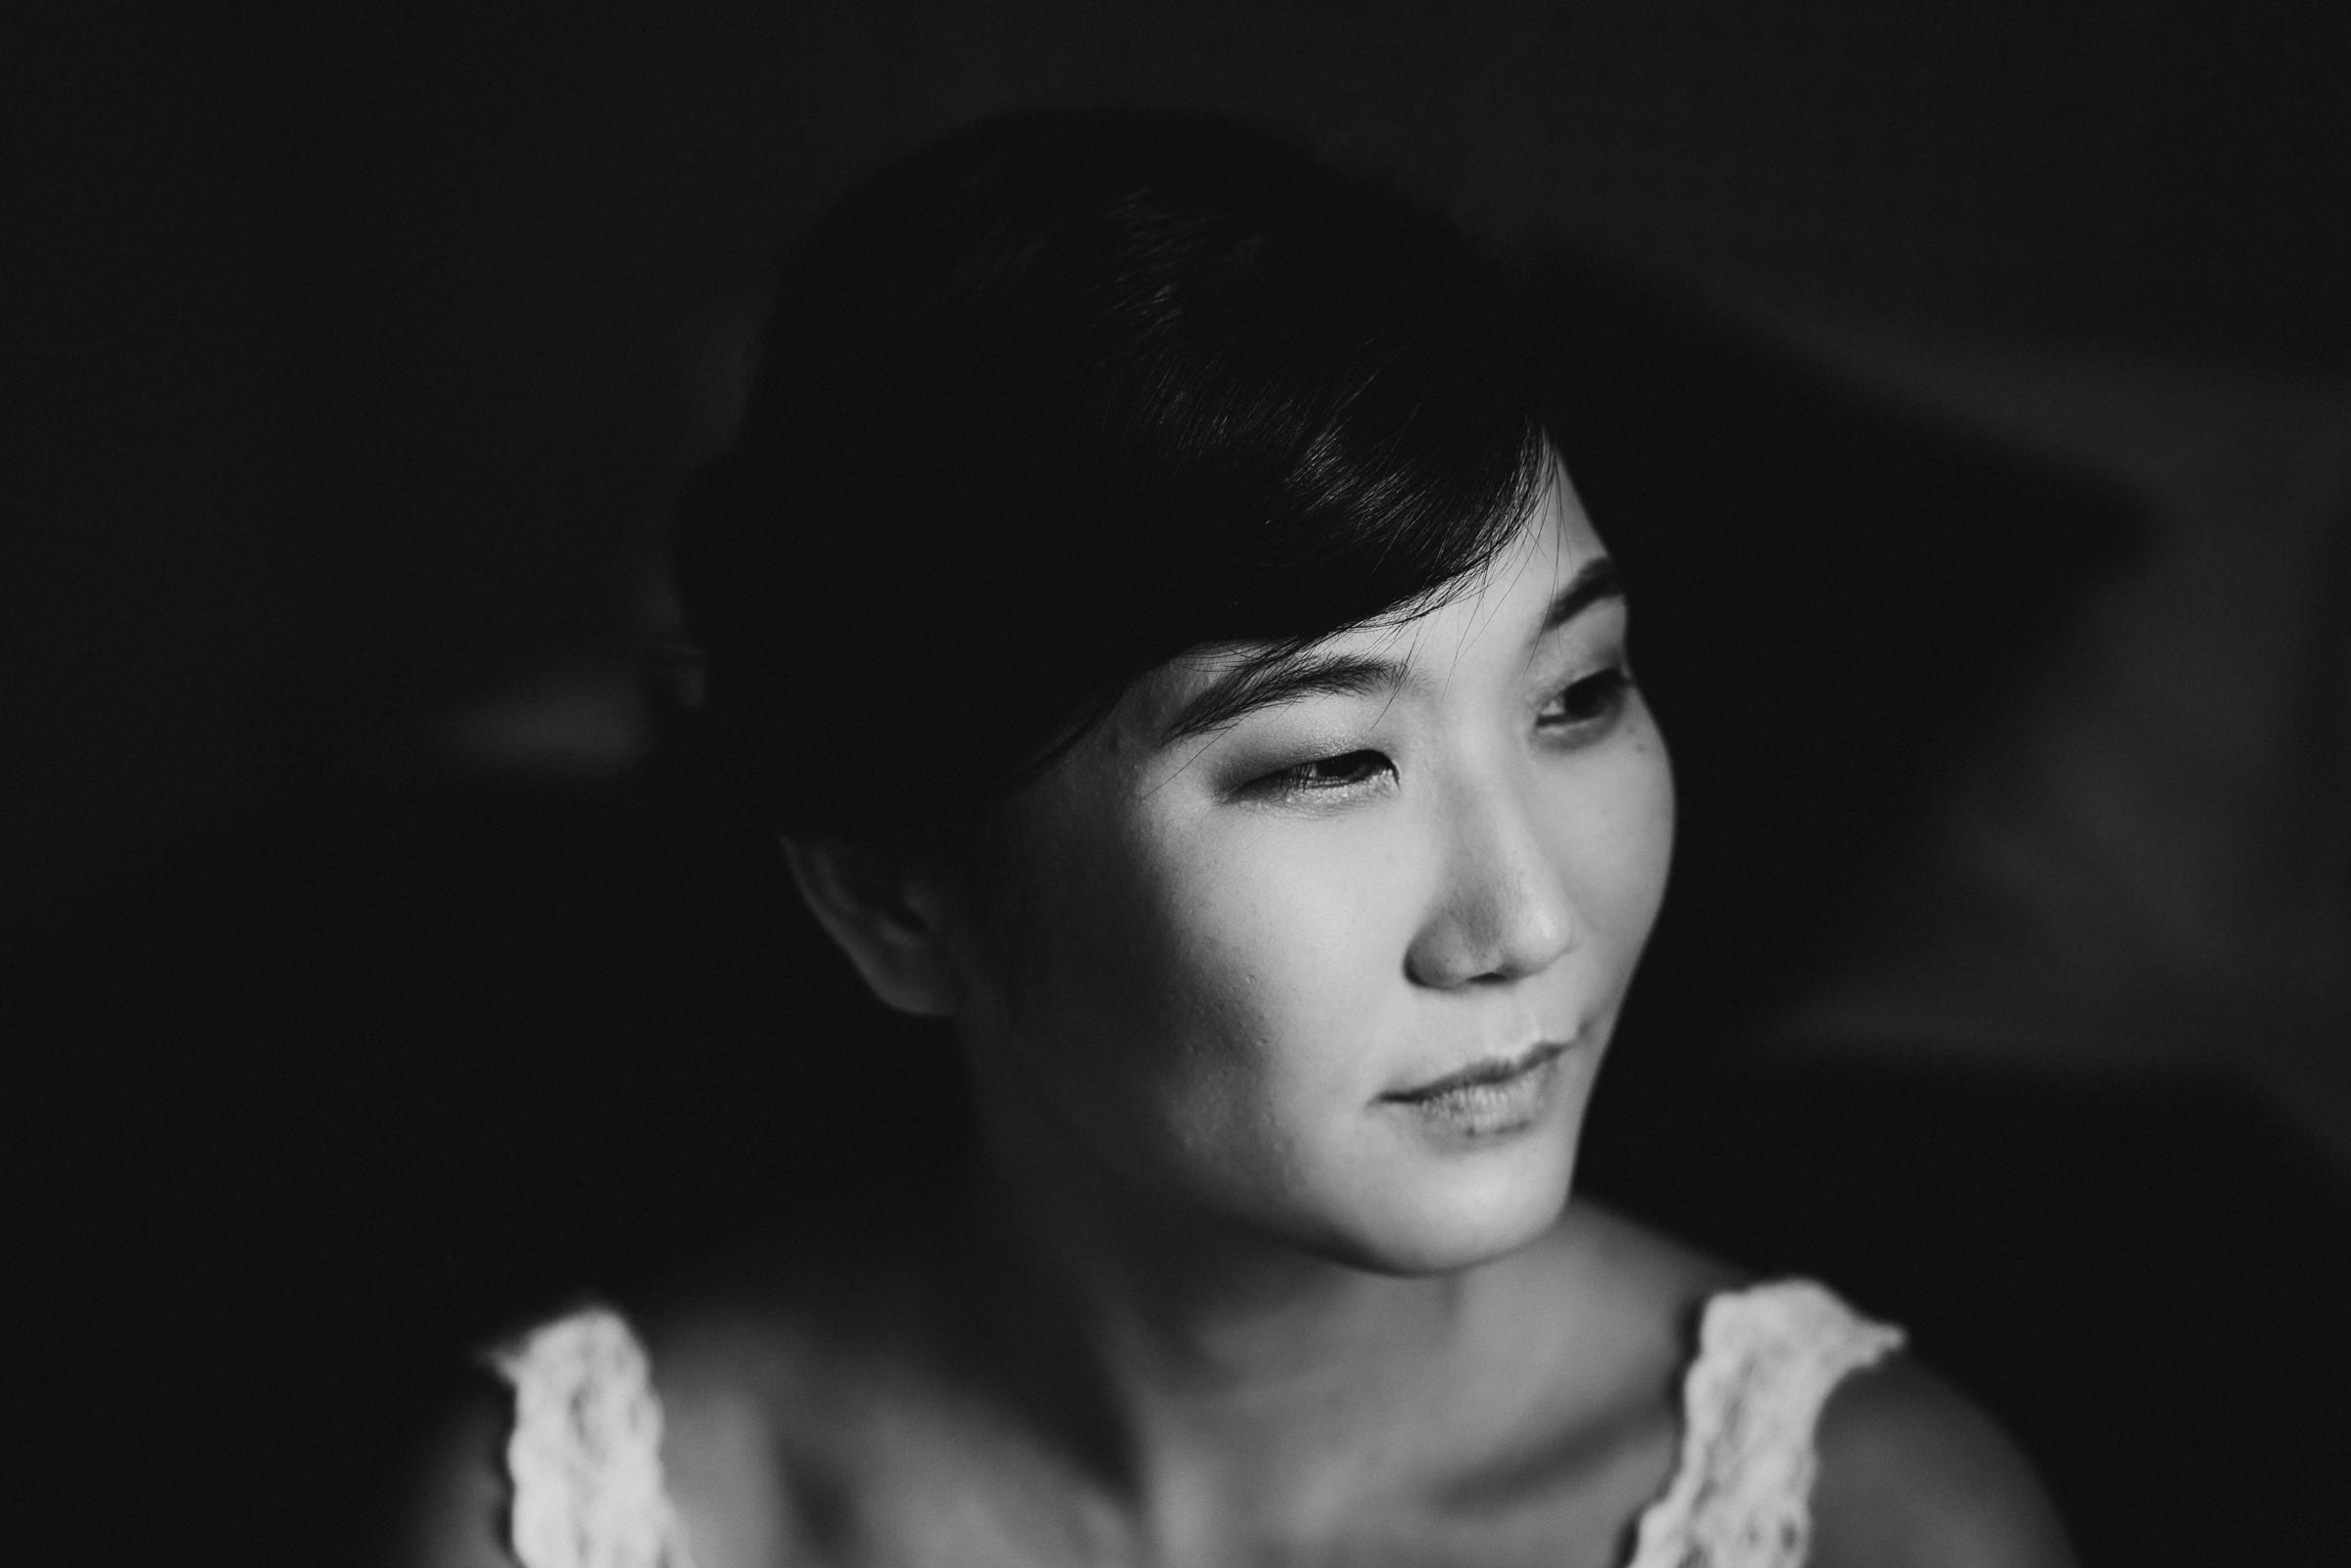 My-Moon-Brooklyn-LGBT-Gay-Documentary-Wedding-Photographer-19.jpg